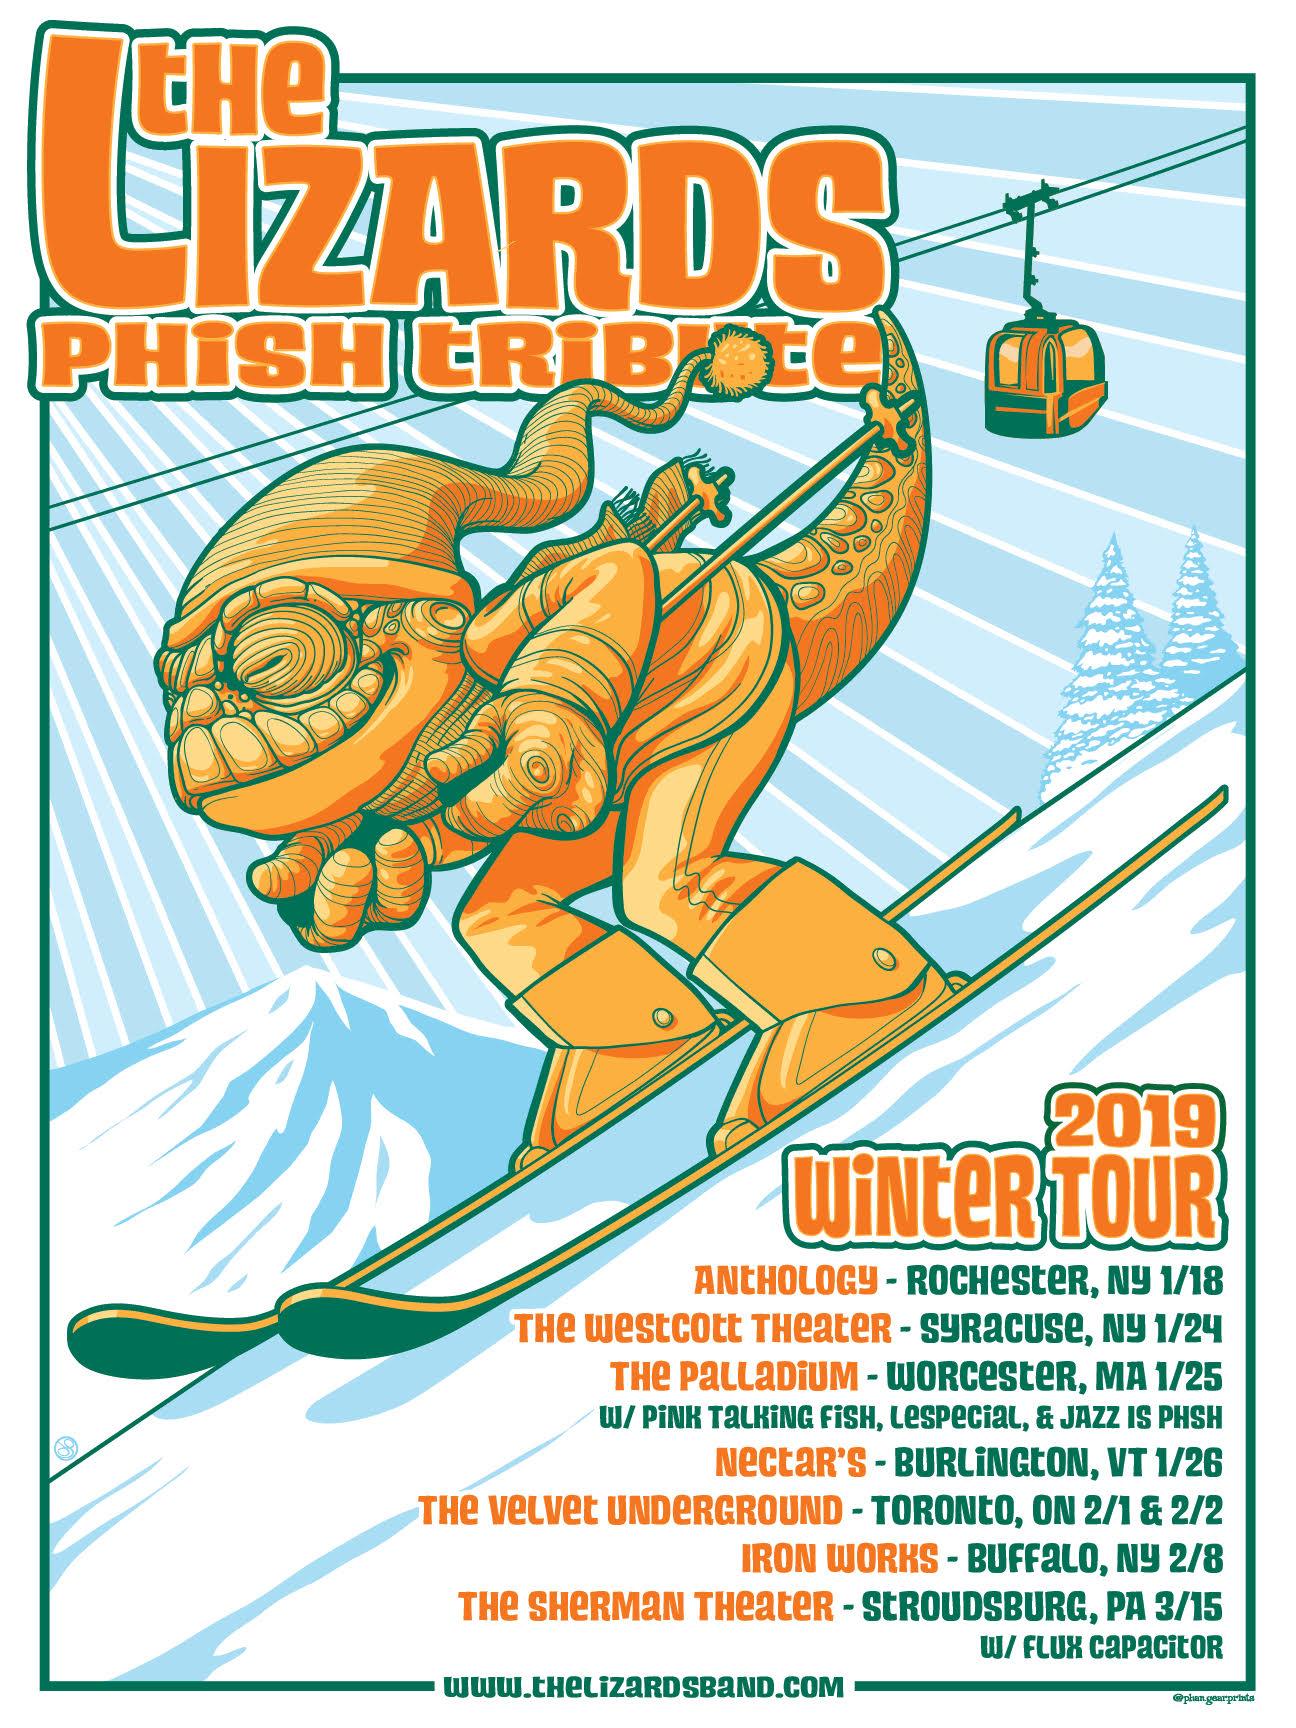 2019 winter tour.jpg